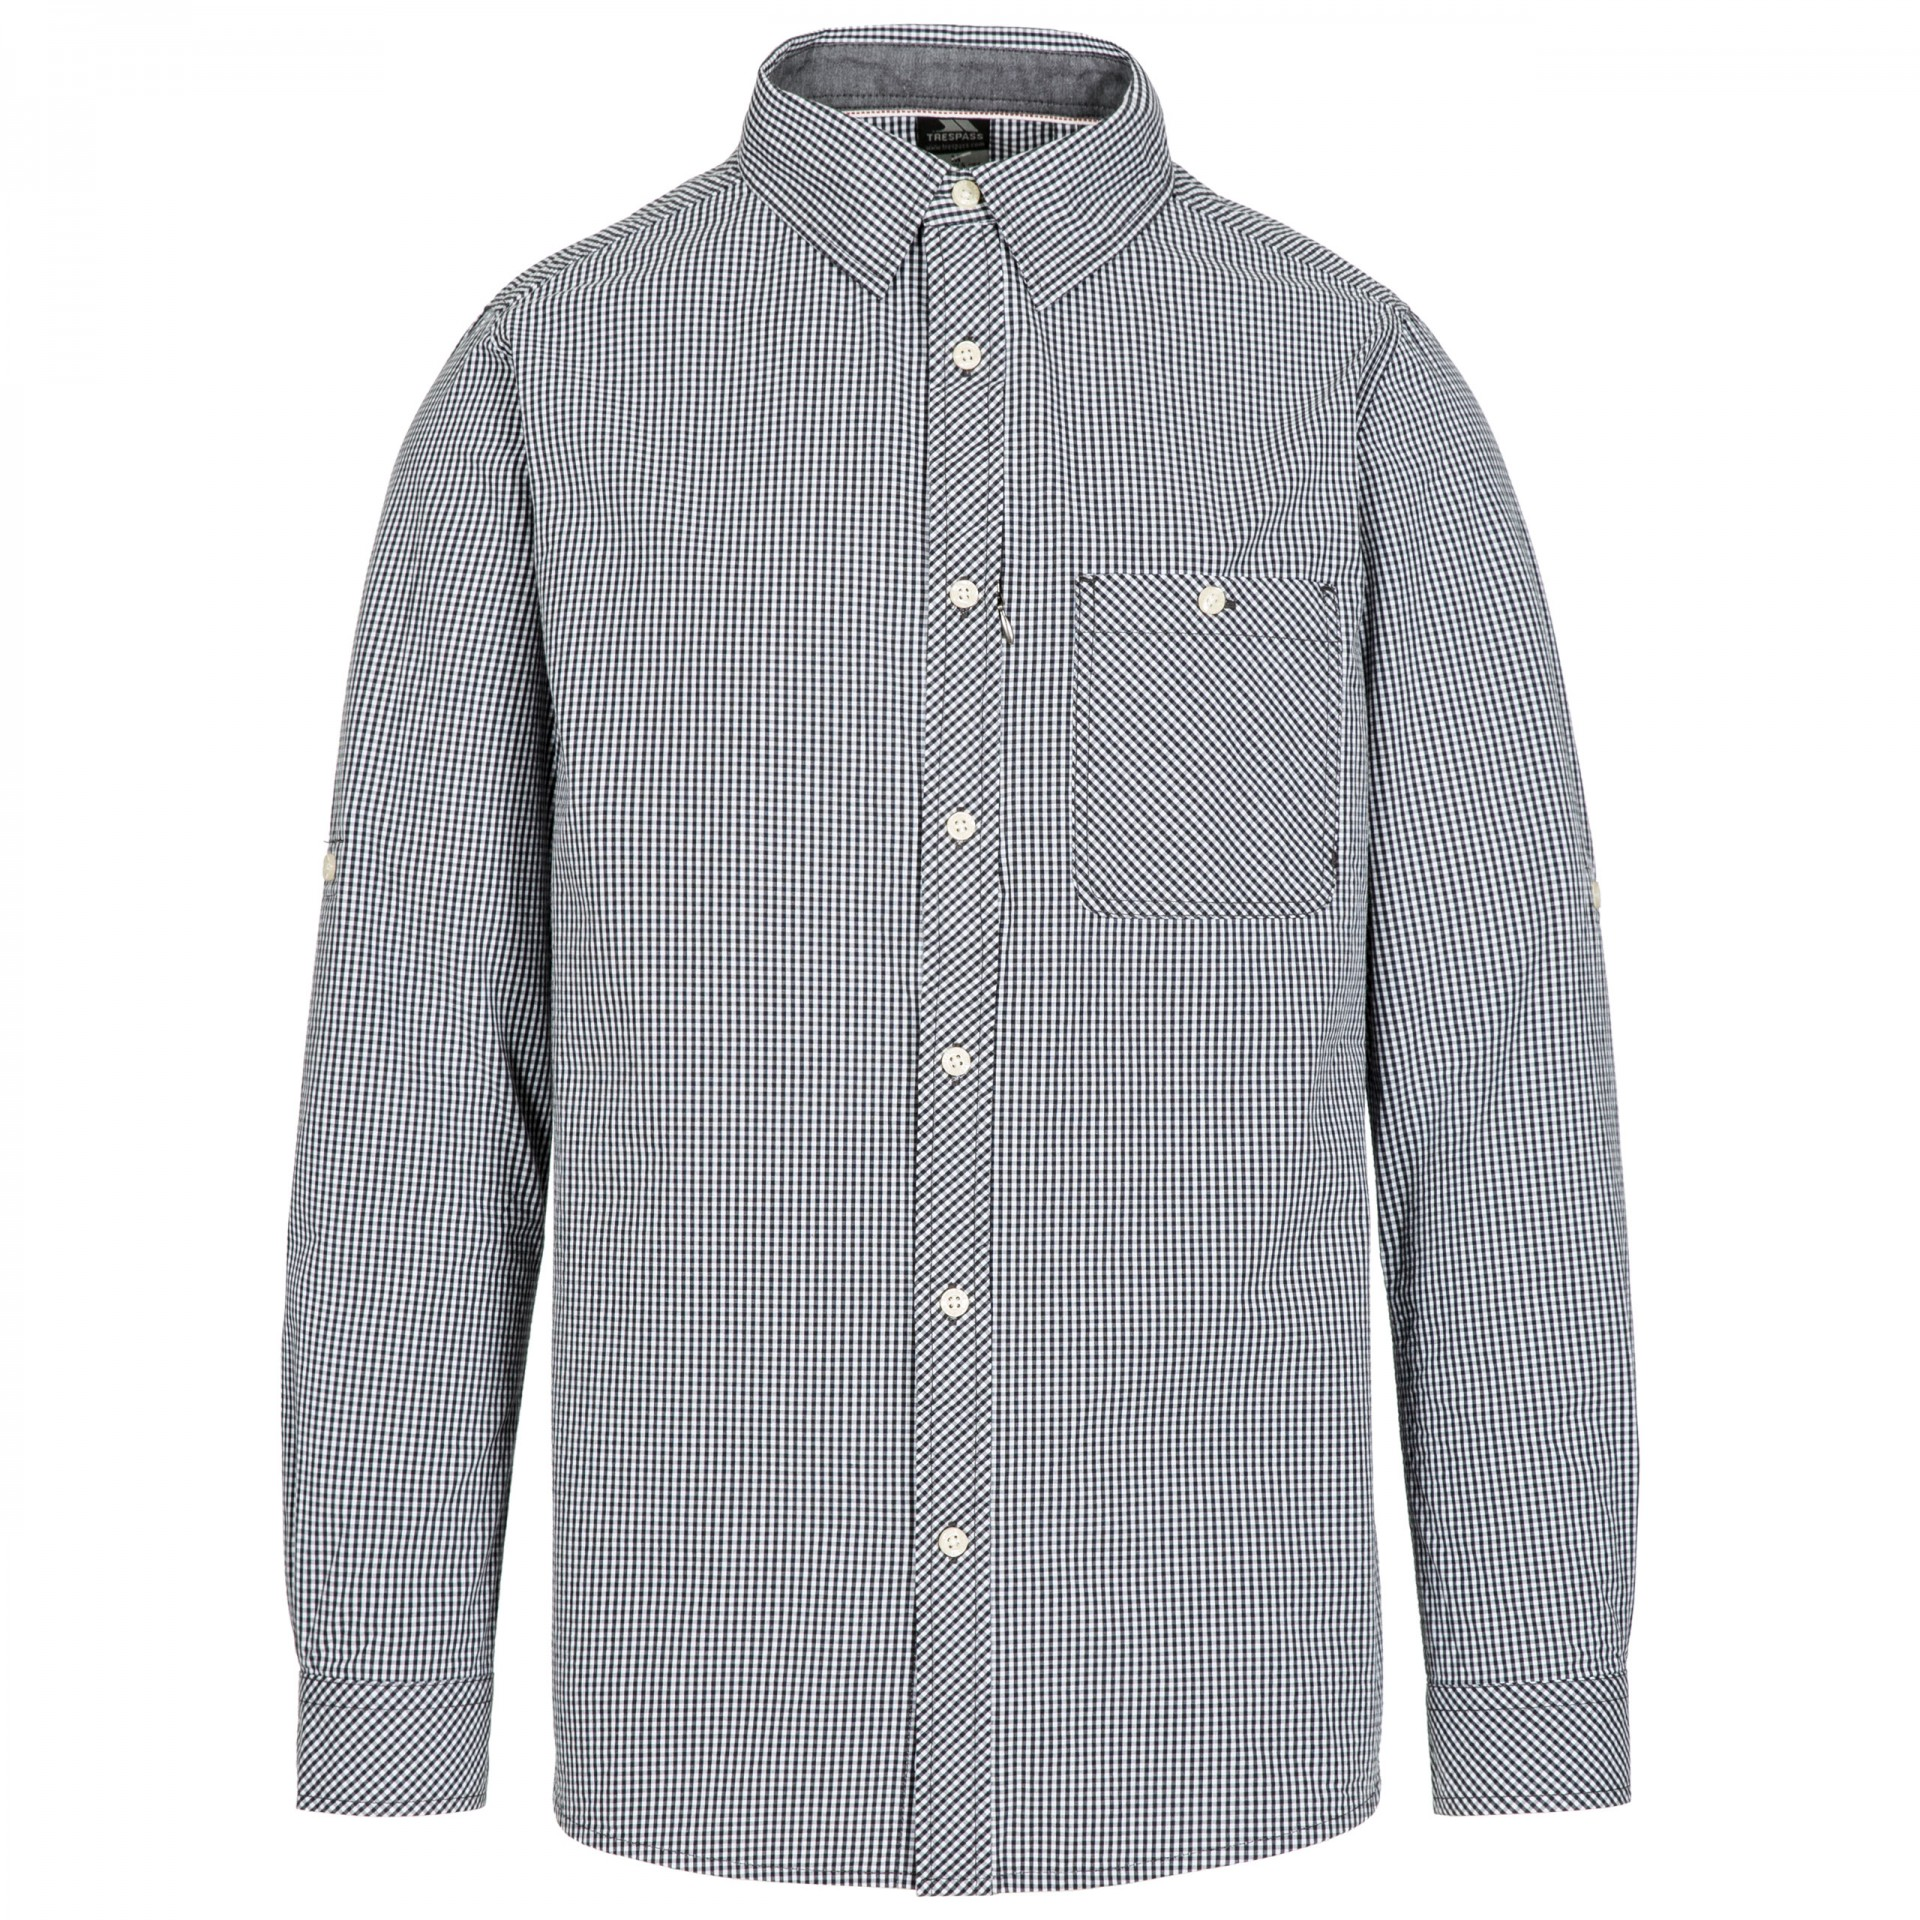 Trespass Mens Yaddlethorpe Cotton Shirt (XXS) (Black Gingham)